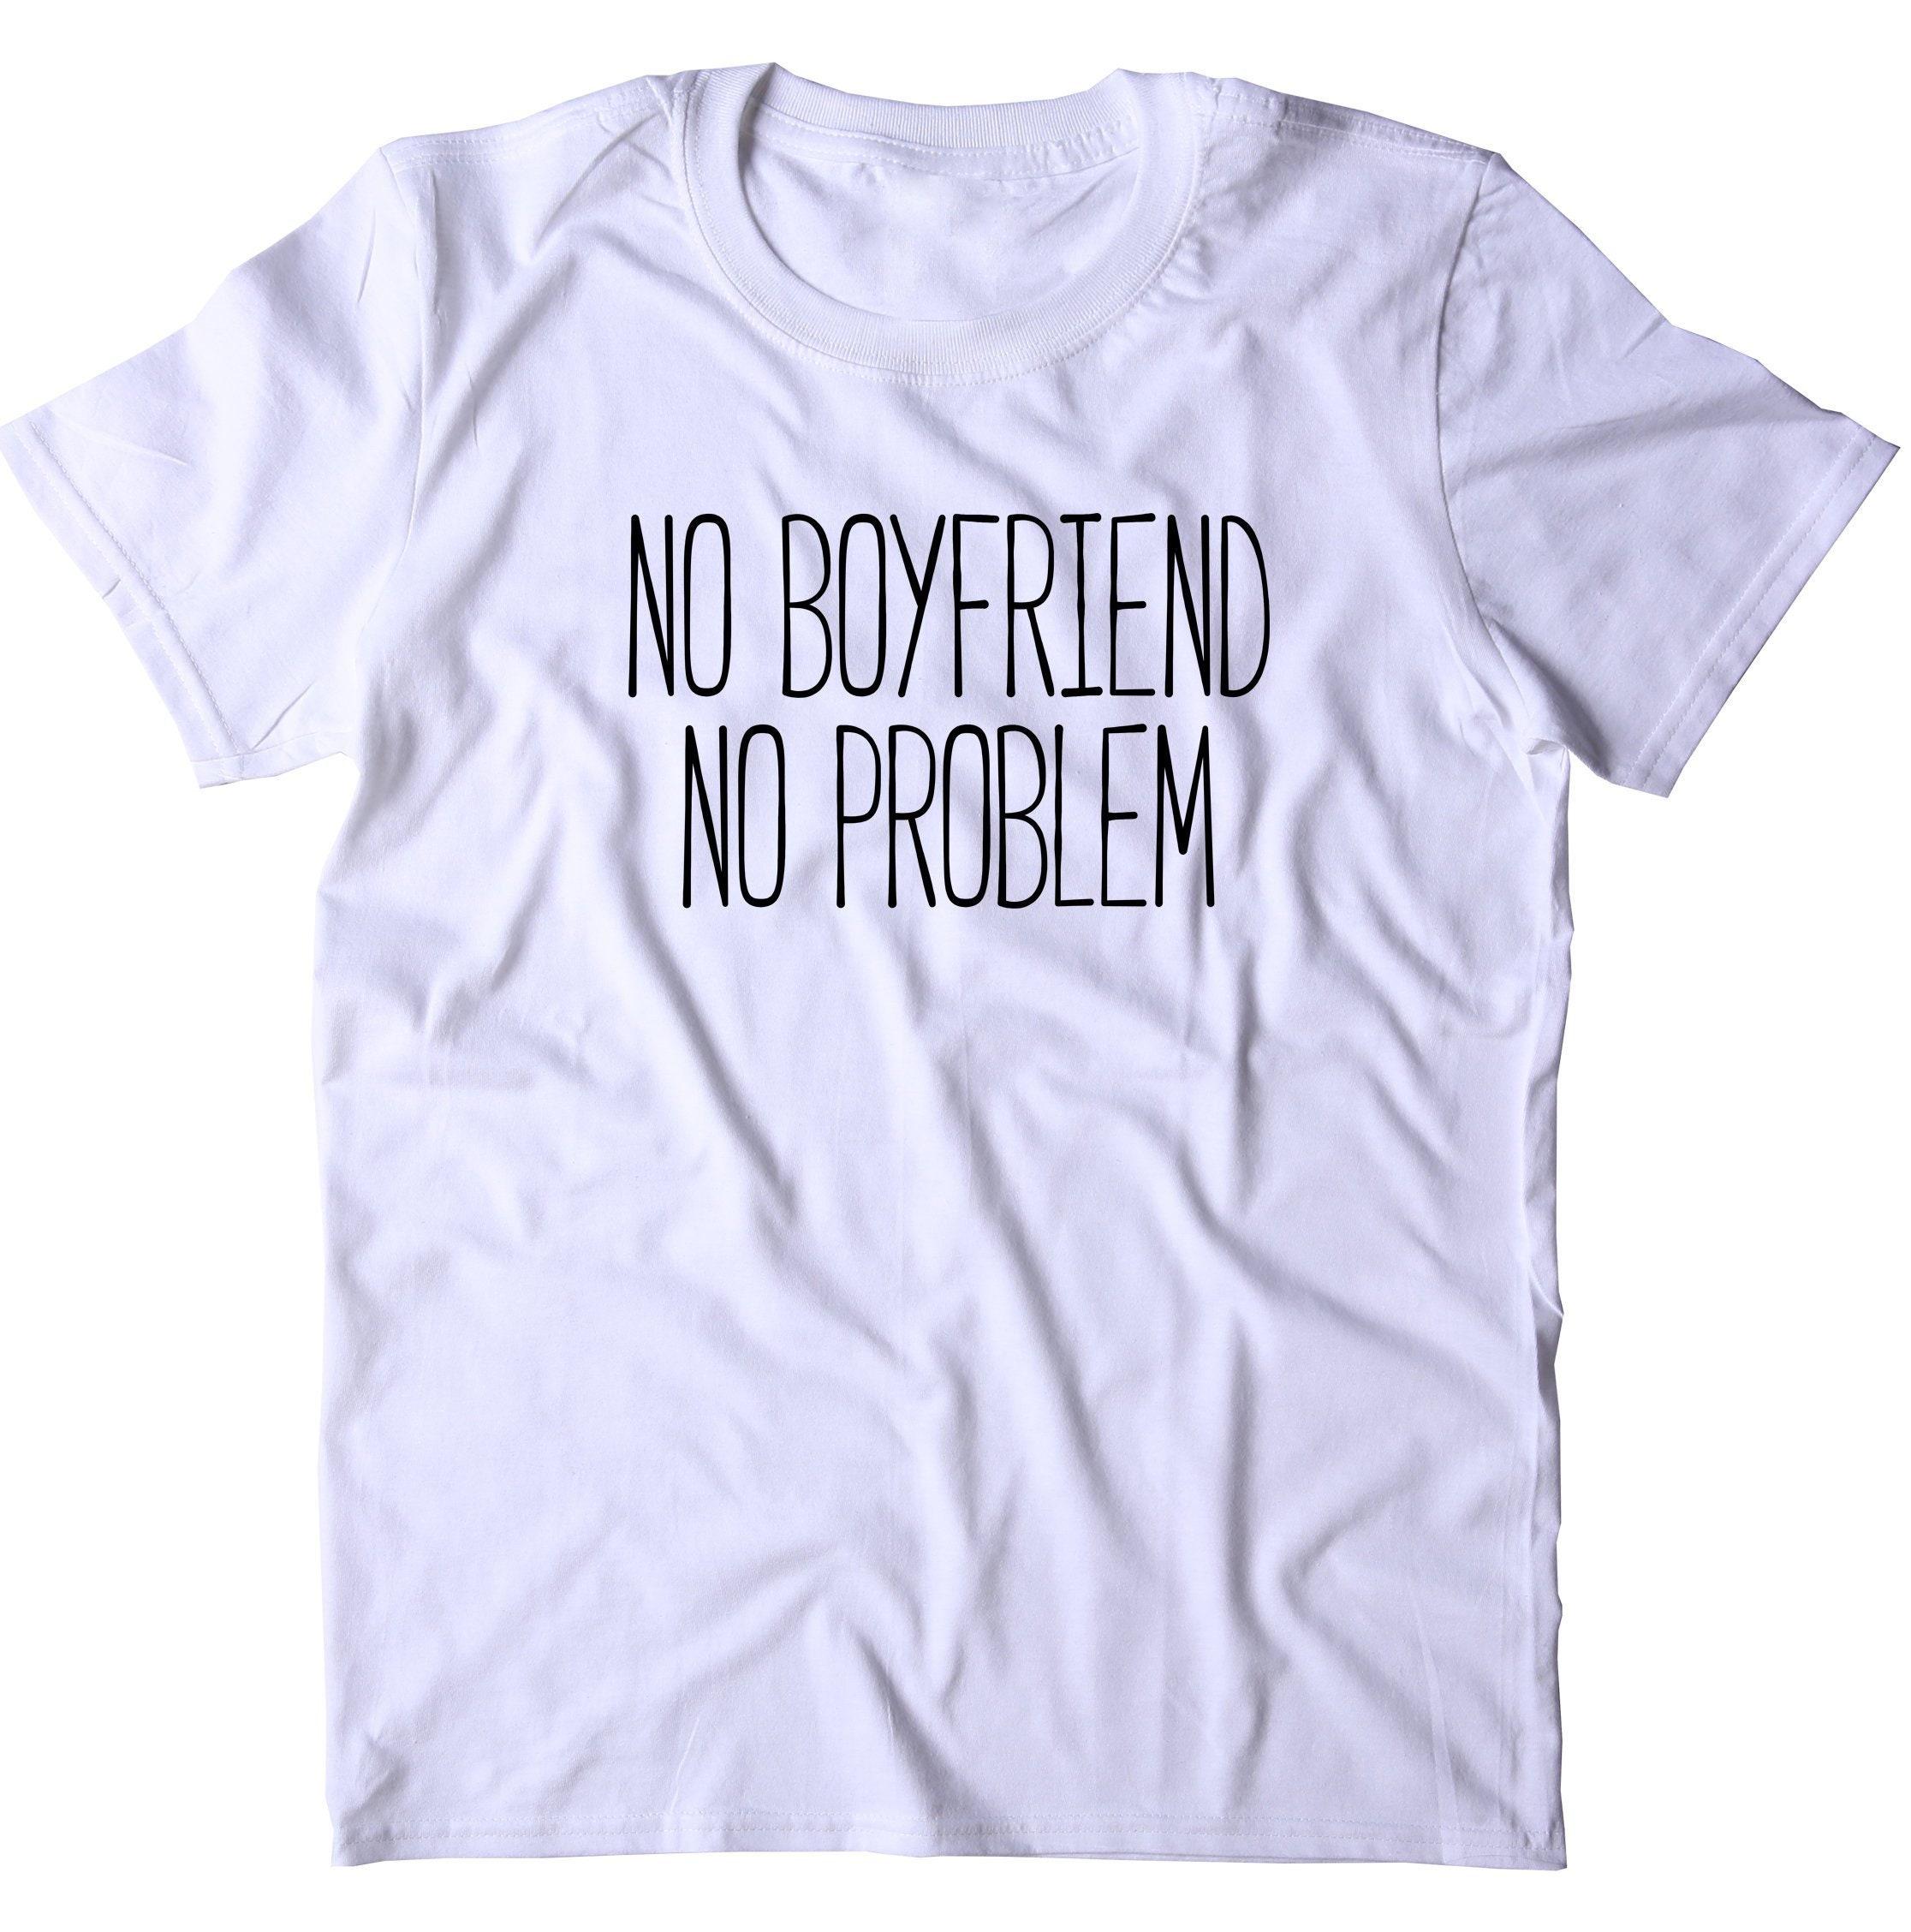 No Boyfriend No Problem Shirt Funny Sarcastic Ex Boyfriend ...